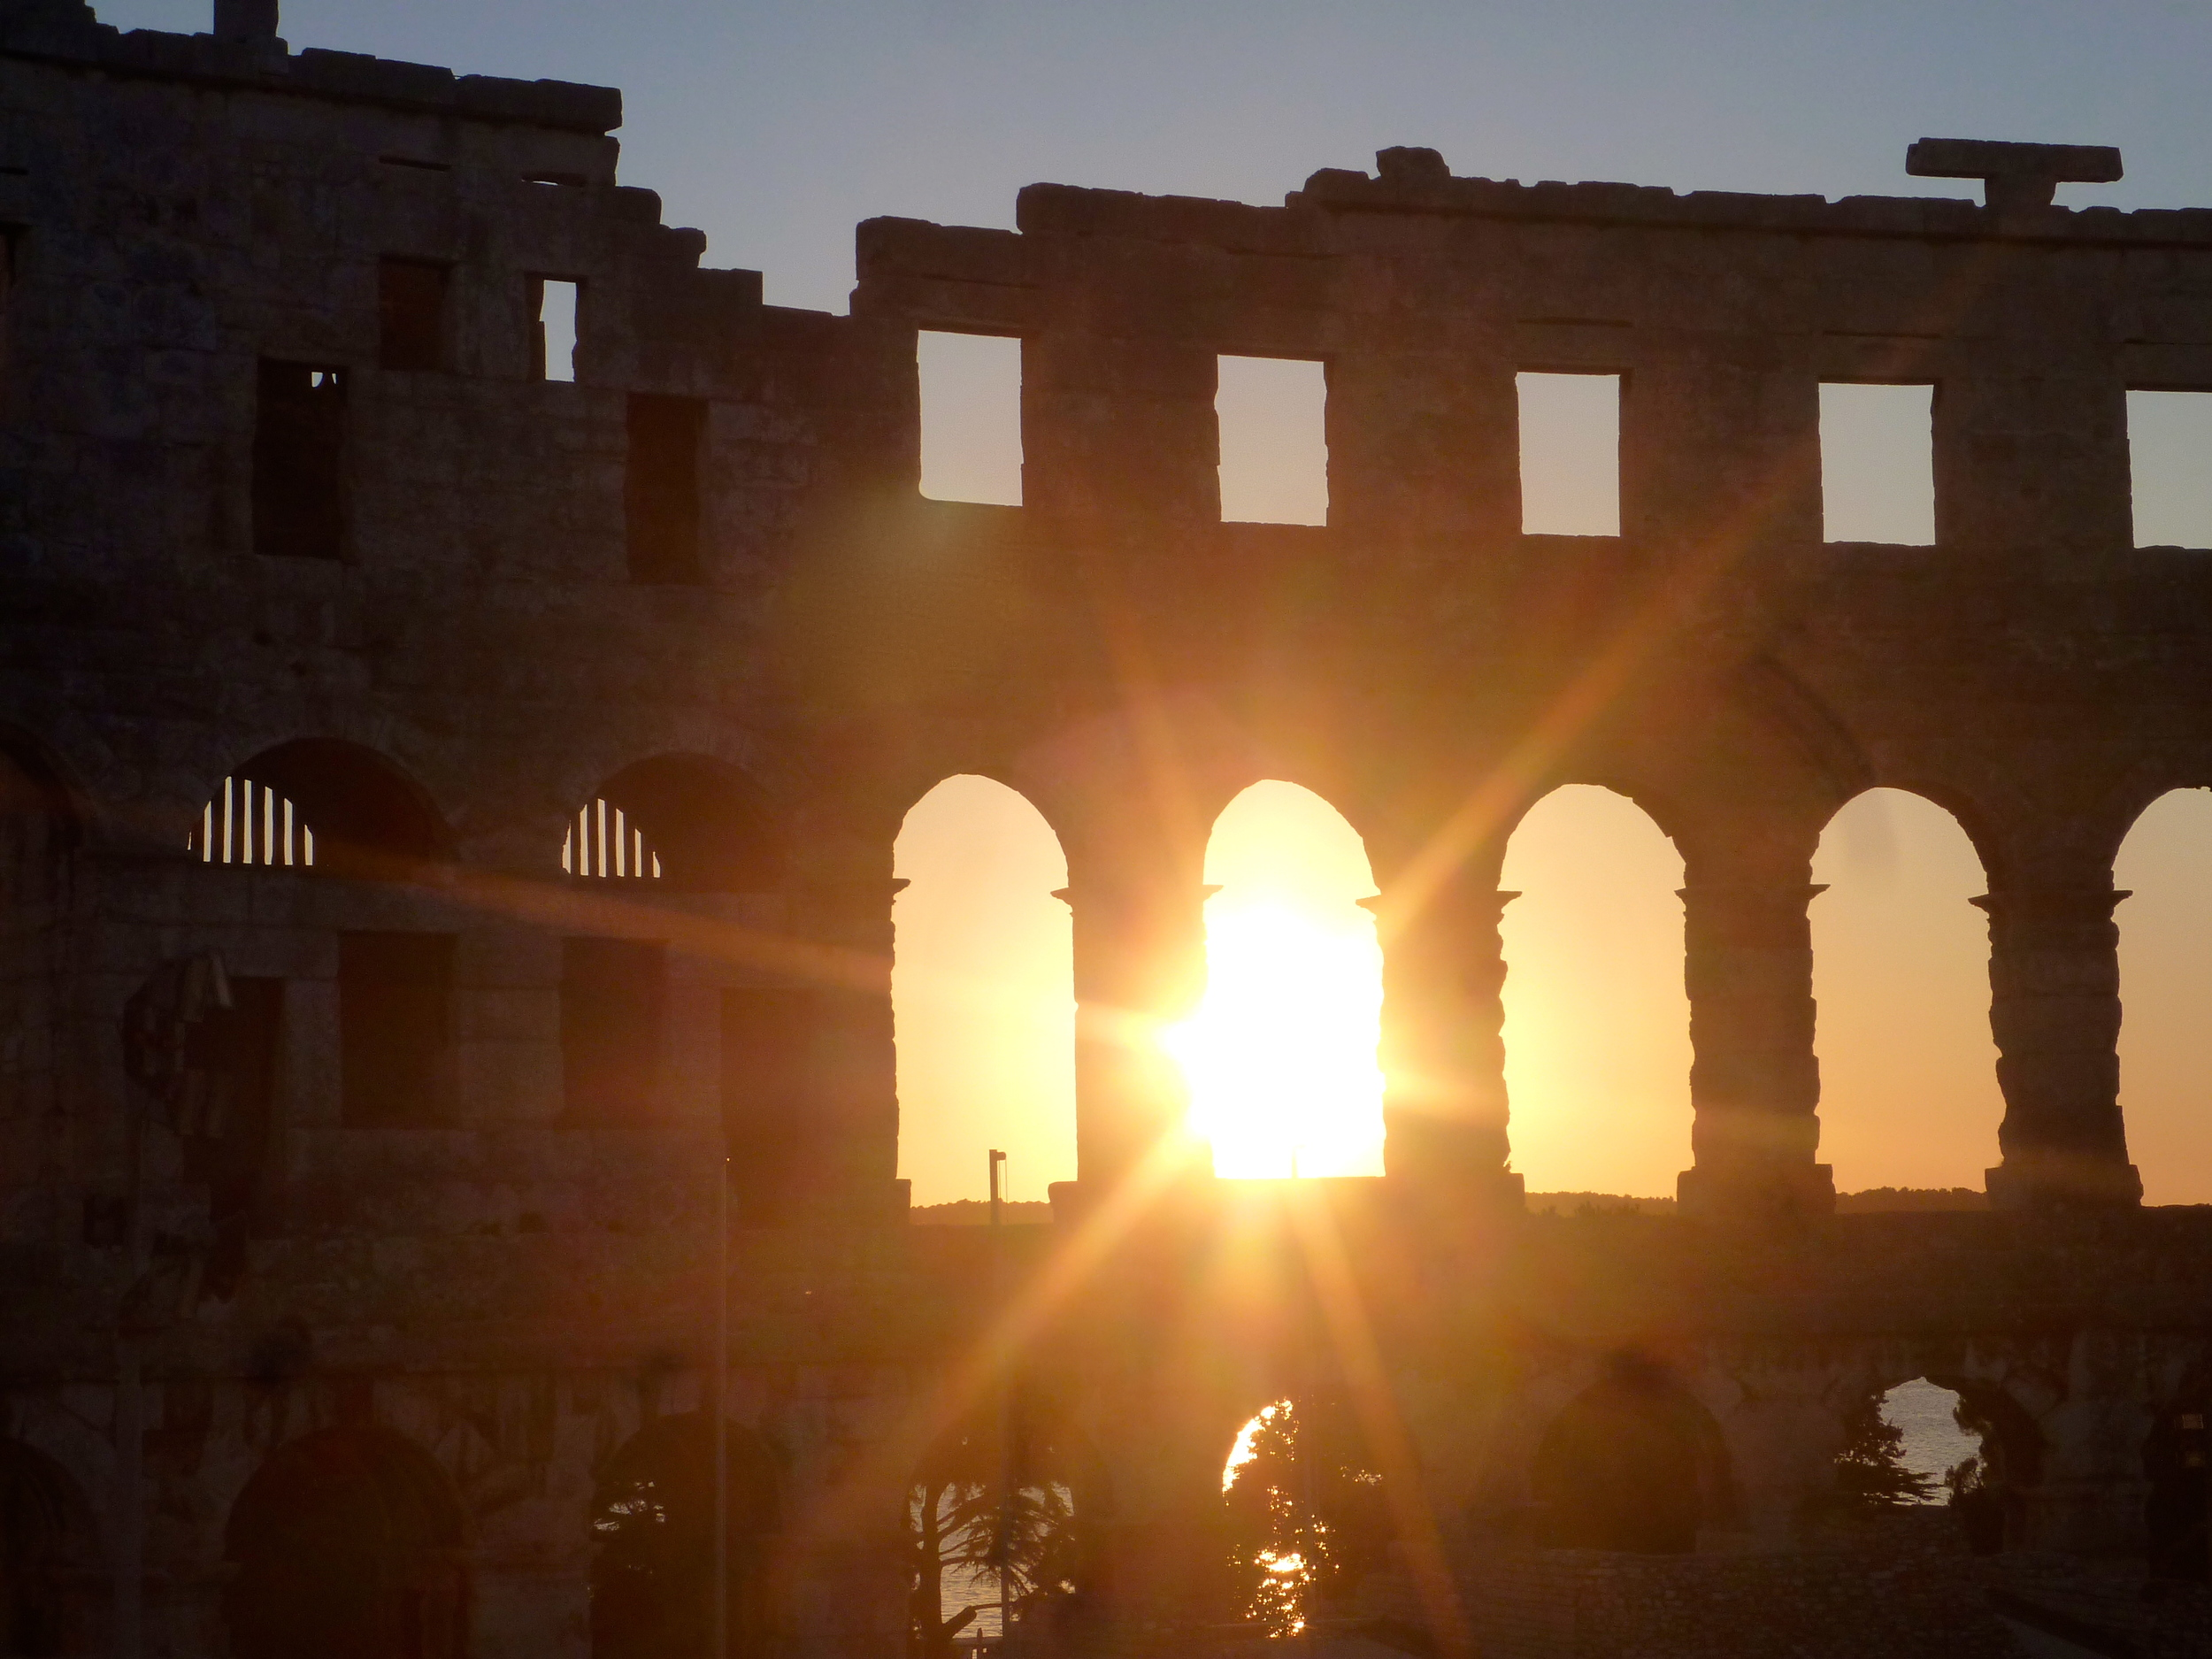 Pula's Roman ampitheatre